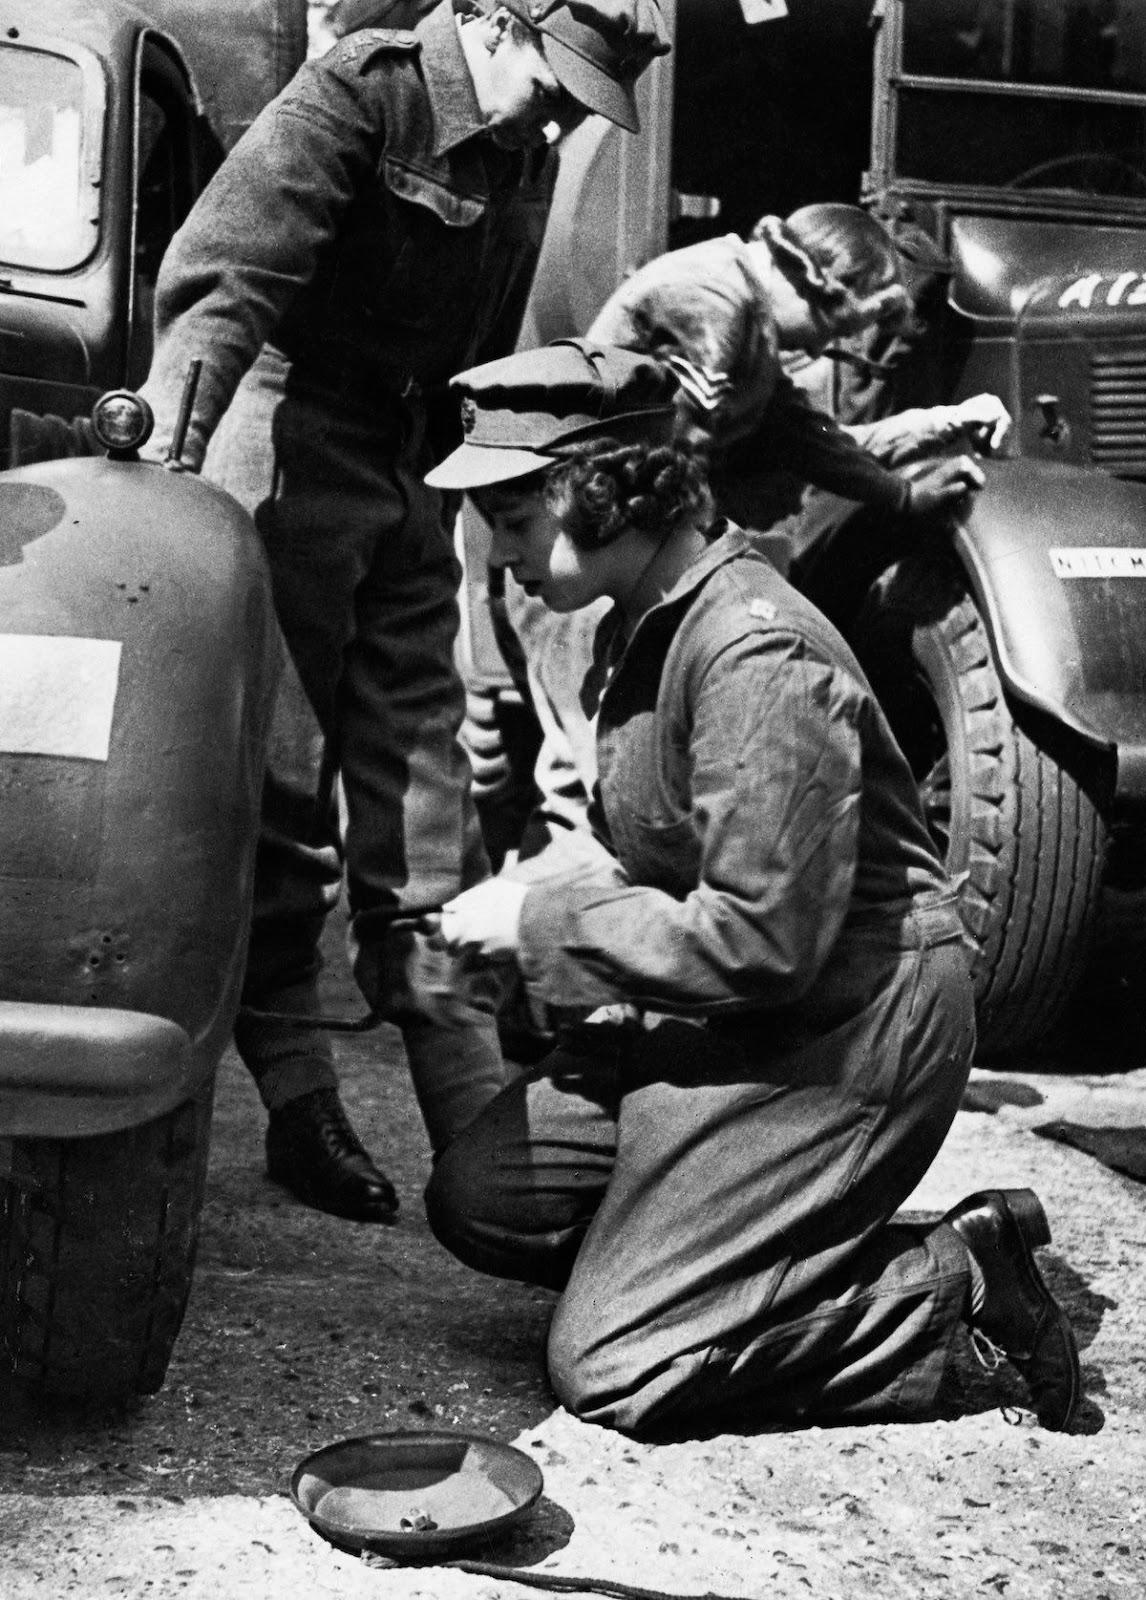 elizabeth queen mechanic ii 1945 army wwii serving driver princess mechanics truck service margaret cars rare mashable repair auto getty